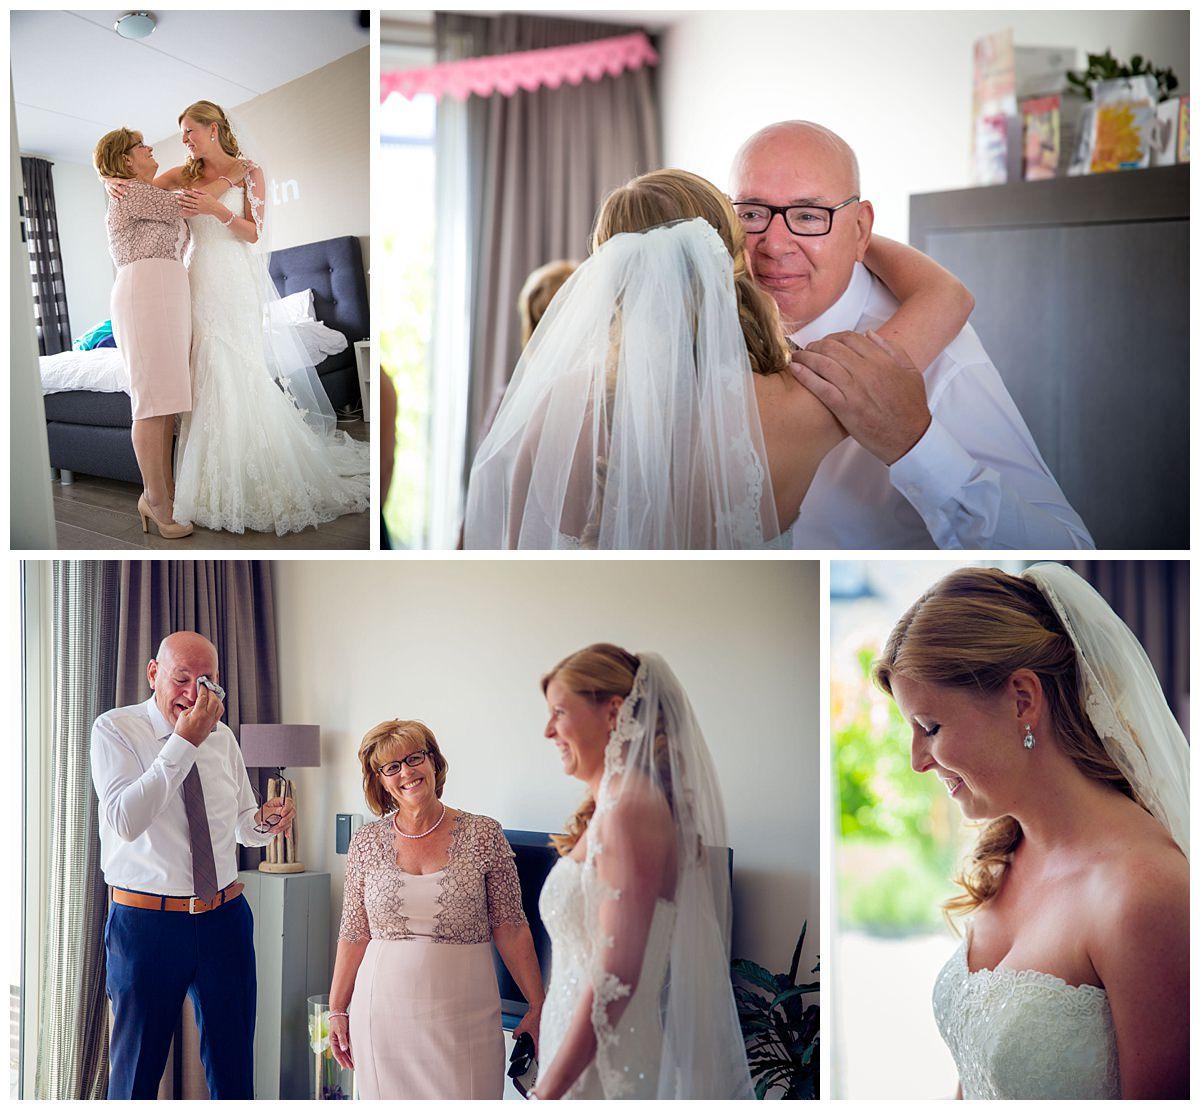 bruidsfotografie Hofstede Meerzigt in Zoetermeer